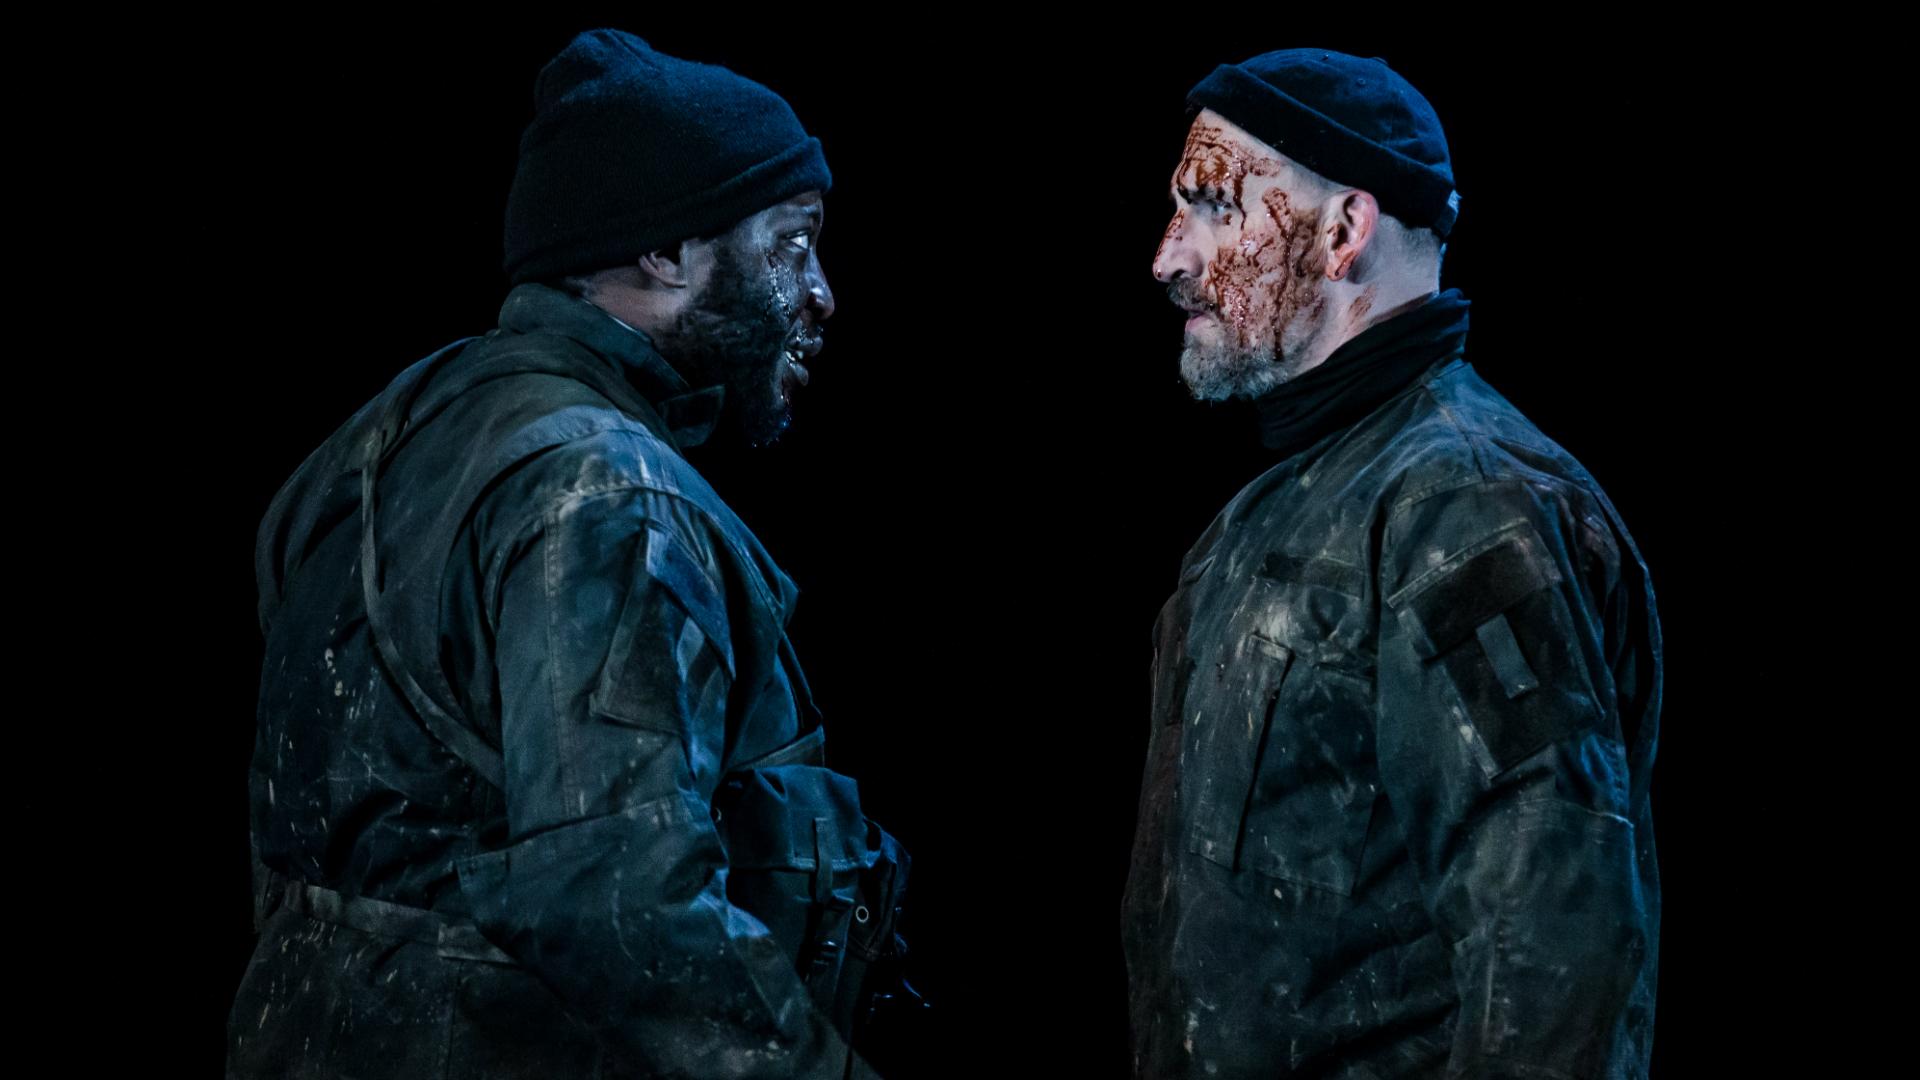 Macbeth at the Barbican. Credit: Richard Davenport. Image courtesy of Royal Shakespeare Company.